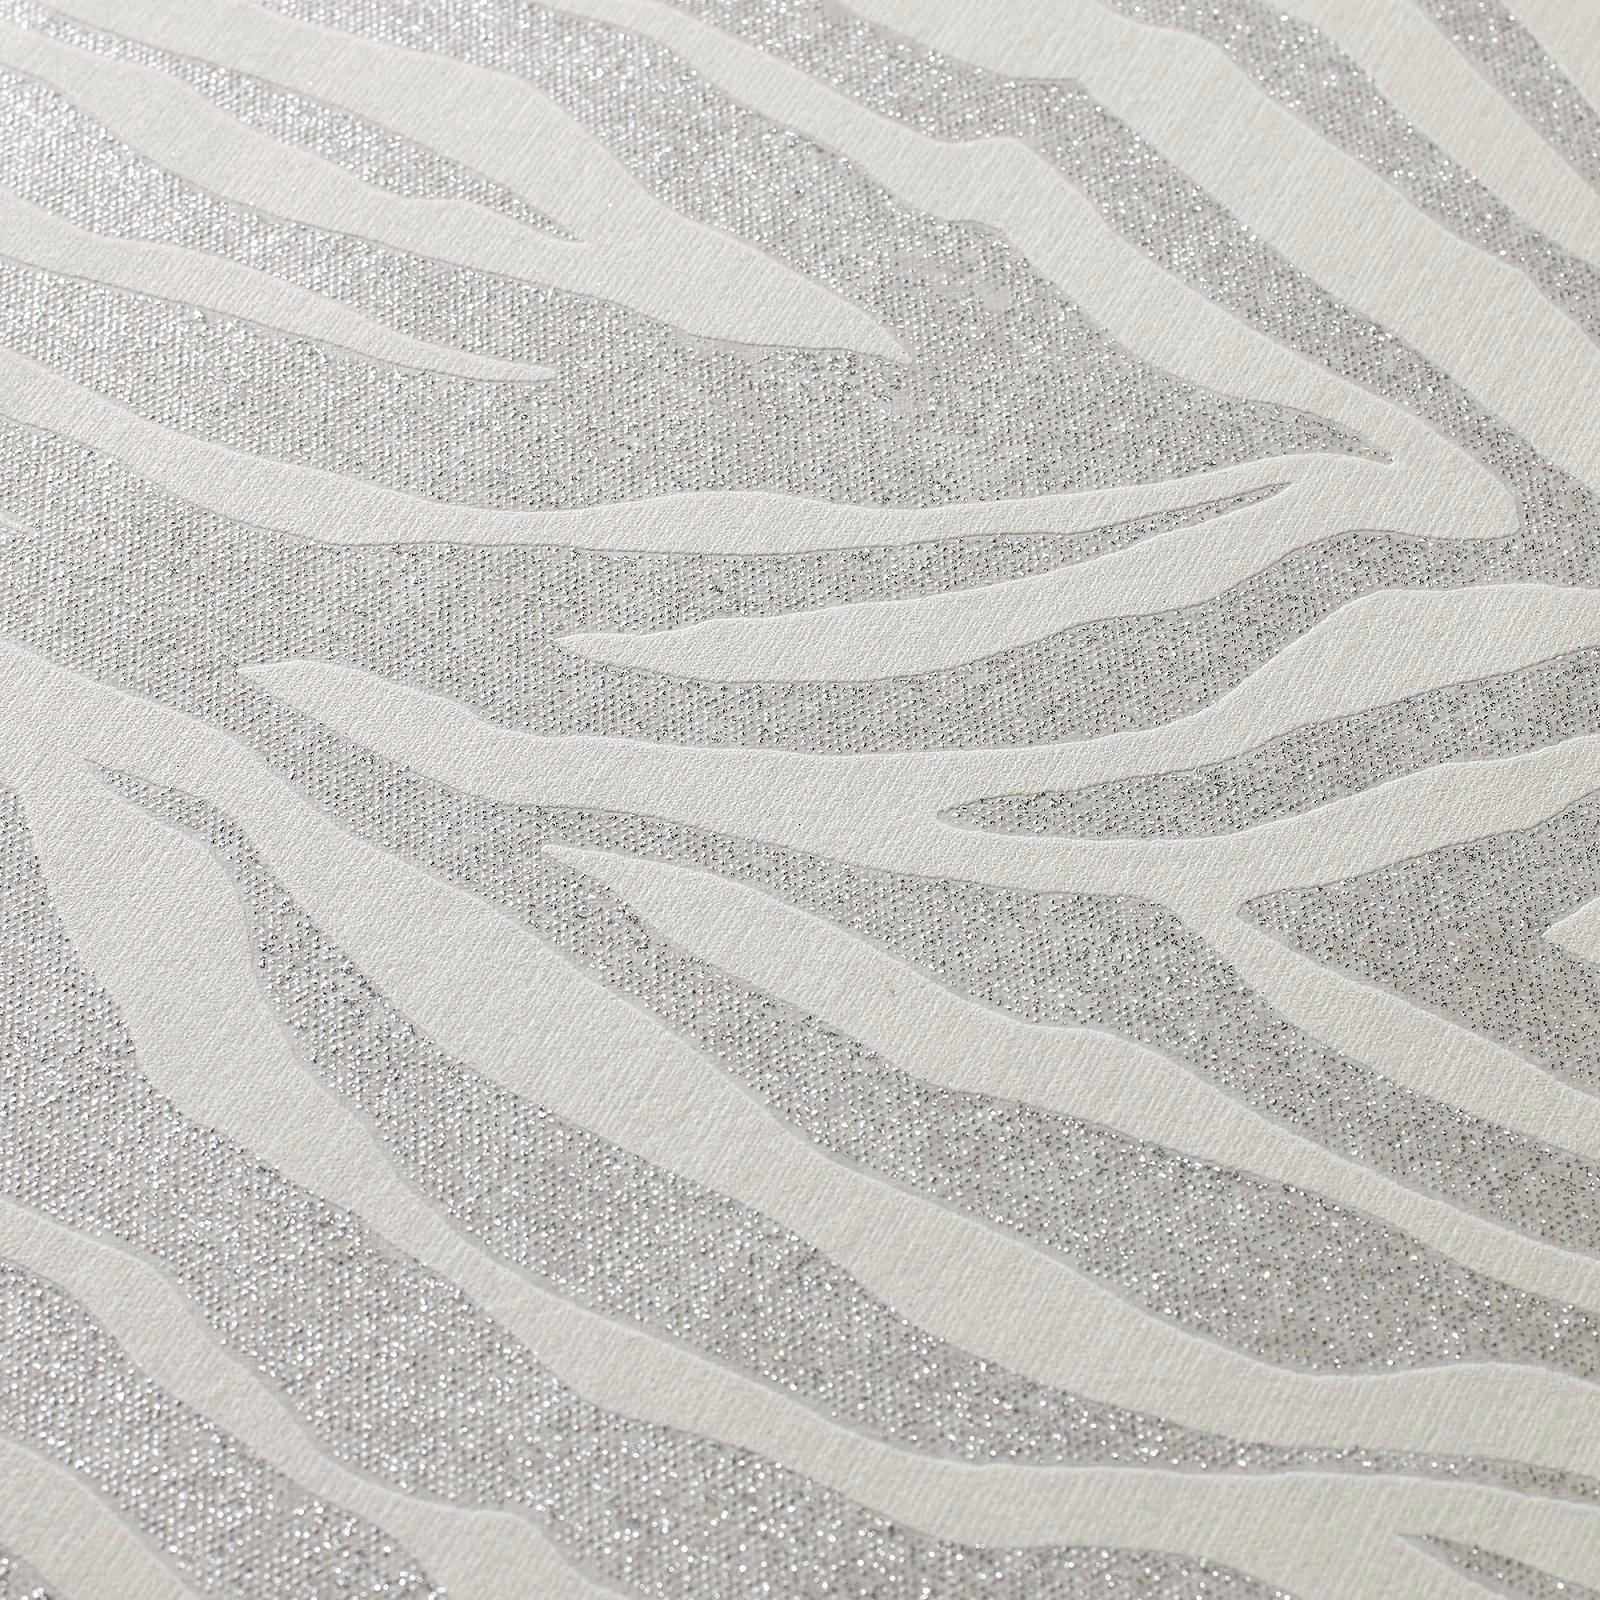 Superfresco Easy Zebra Silver Glitter Wallpaper - Sample Zebra Silver Glitter